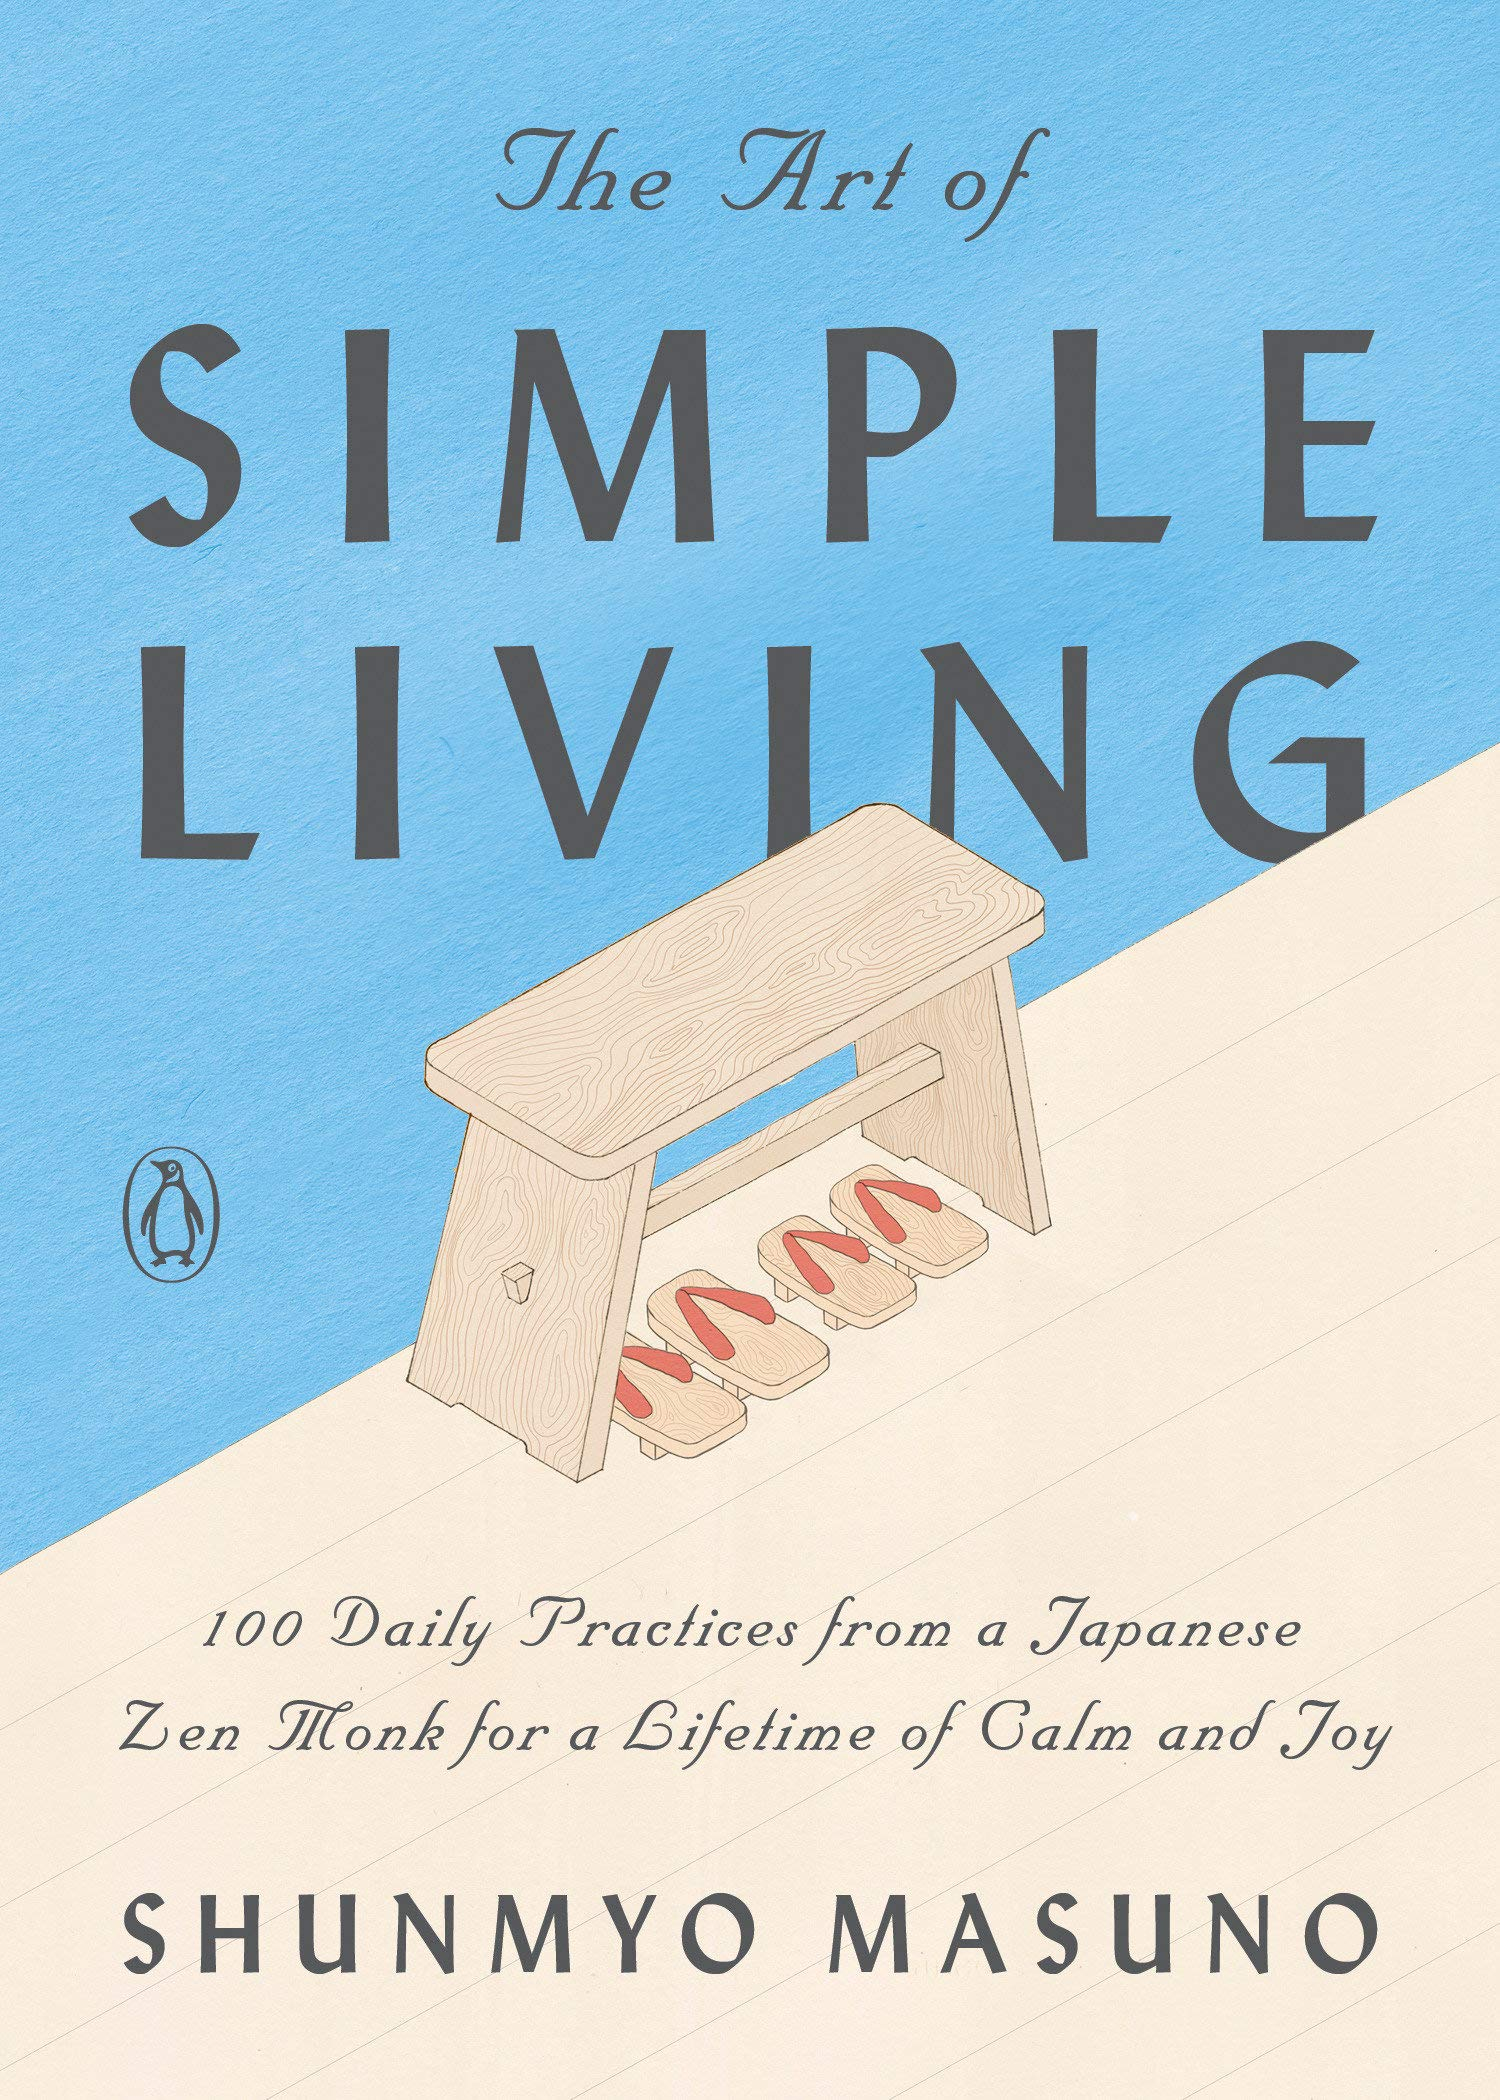 BOOKWORM The art of simple living.jpg